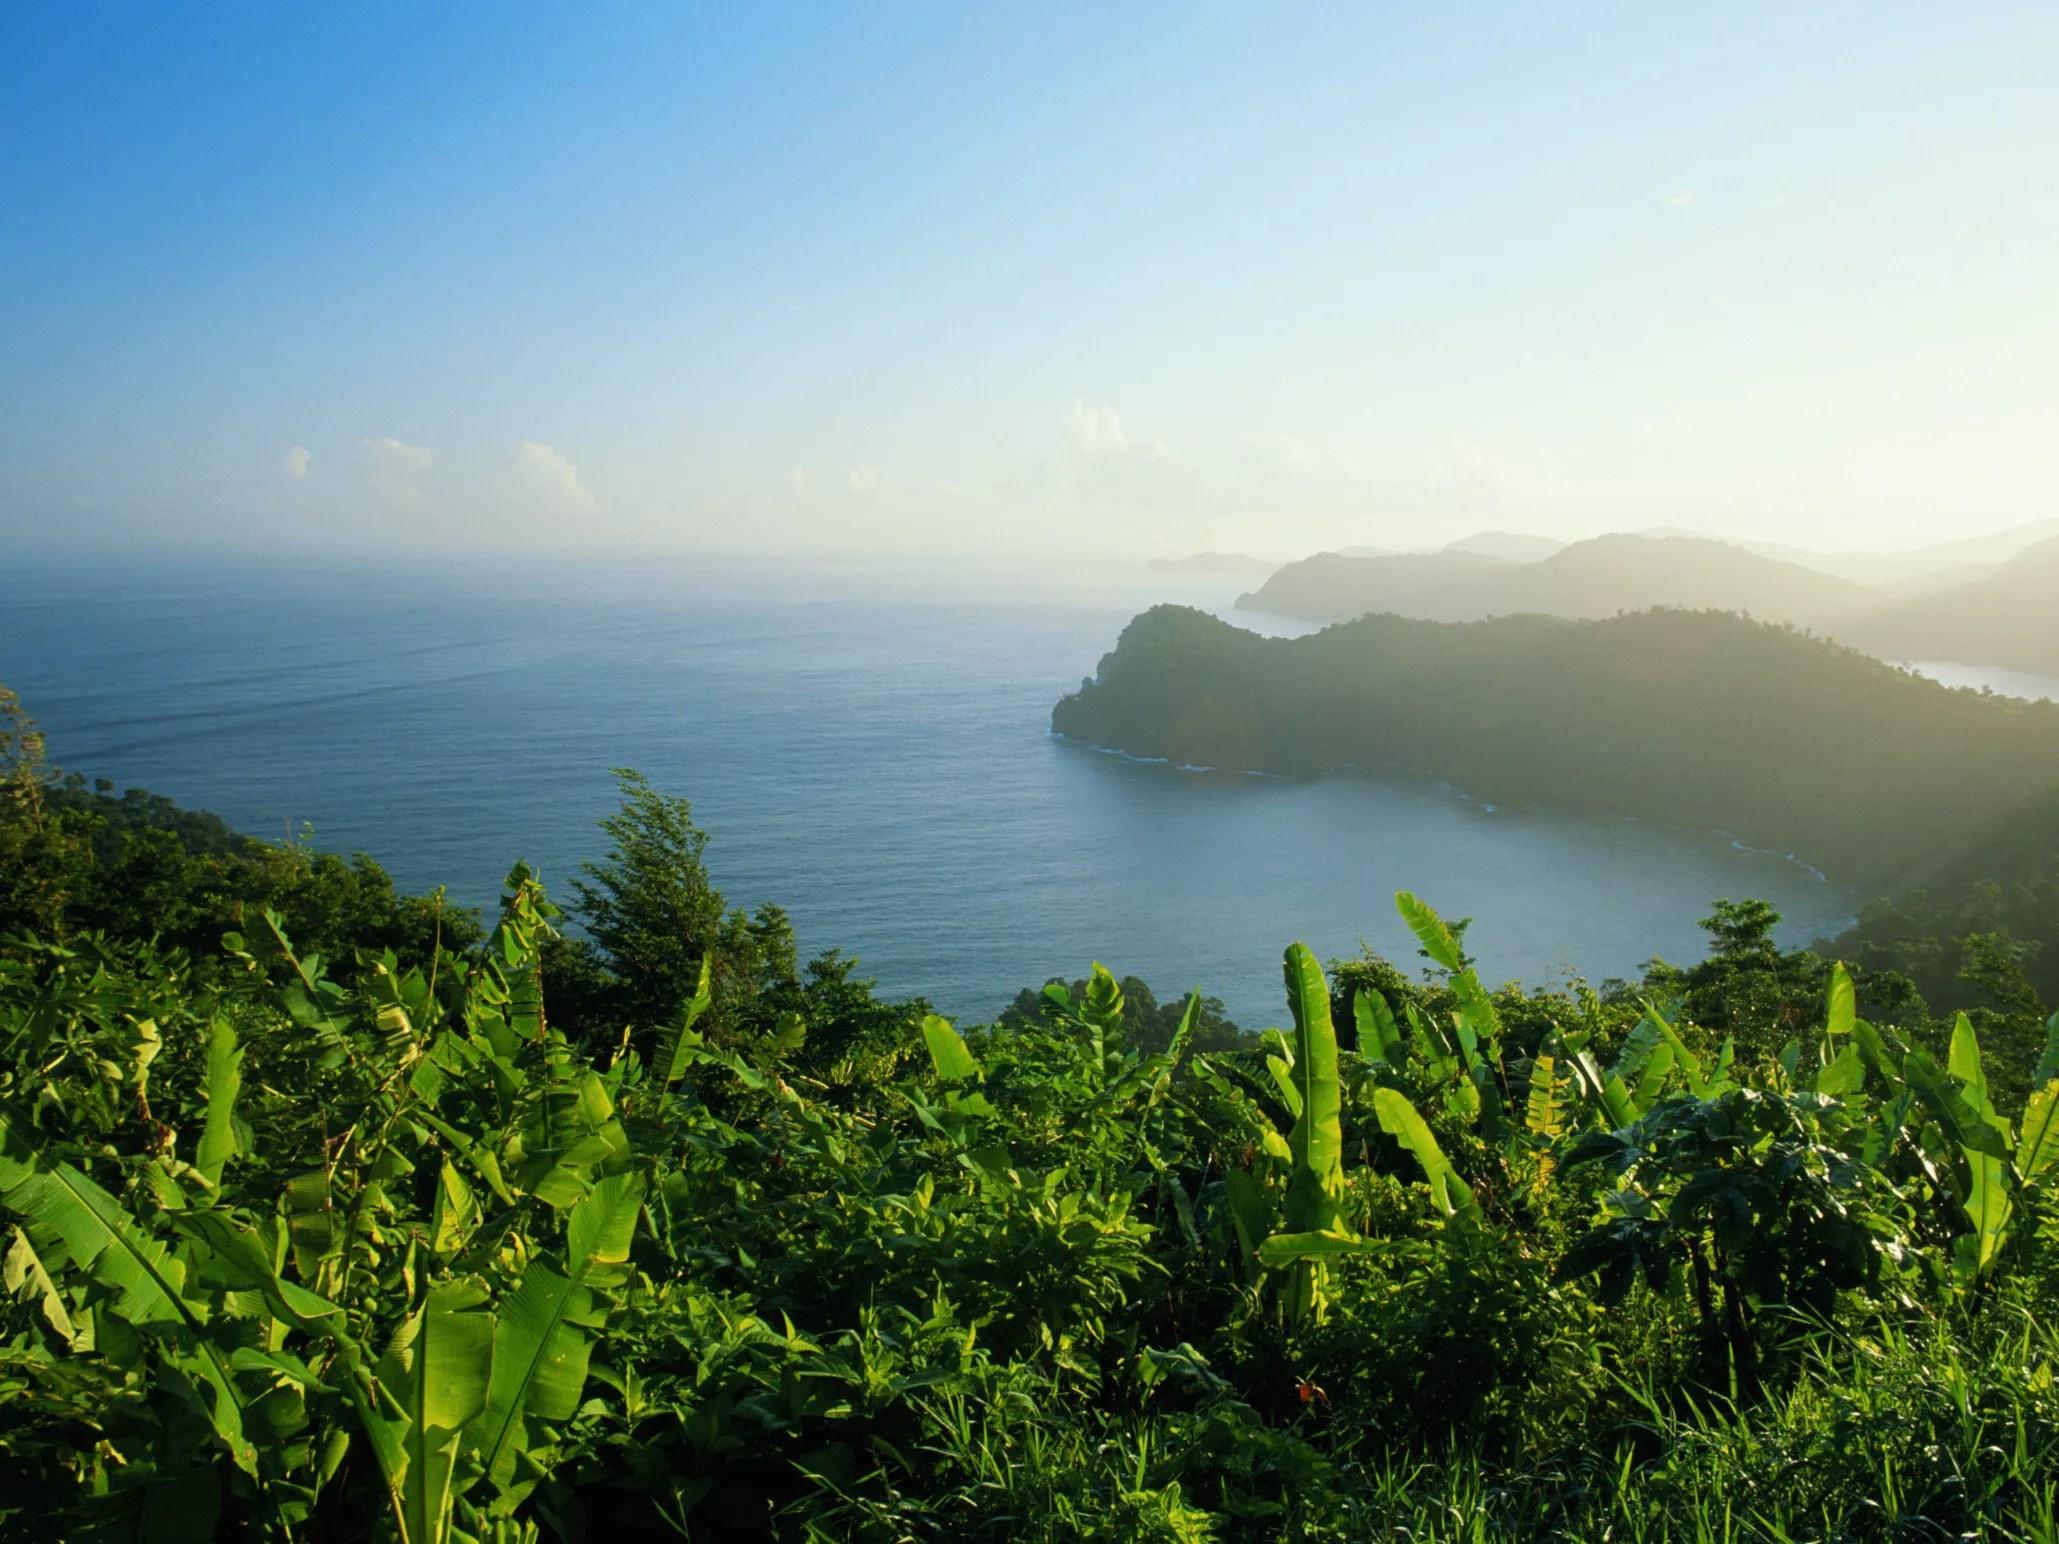 Trinidad Amp Tobago Honeymoon Weather And Travel Guide